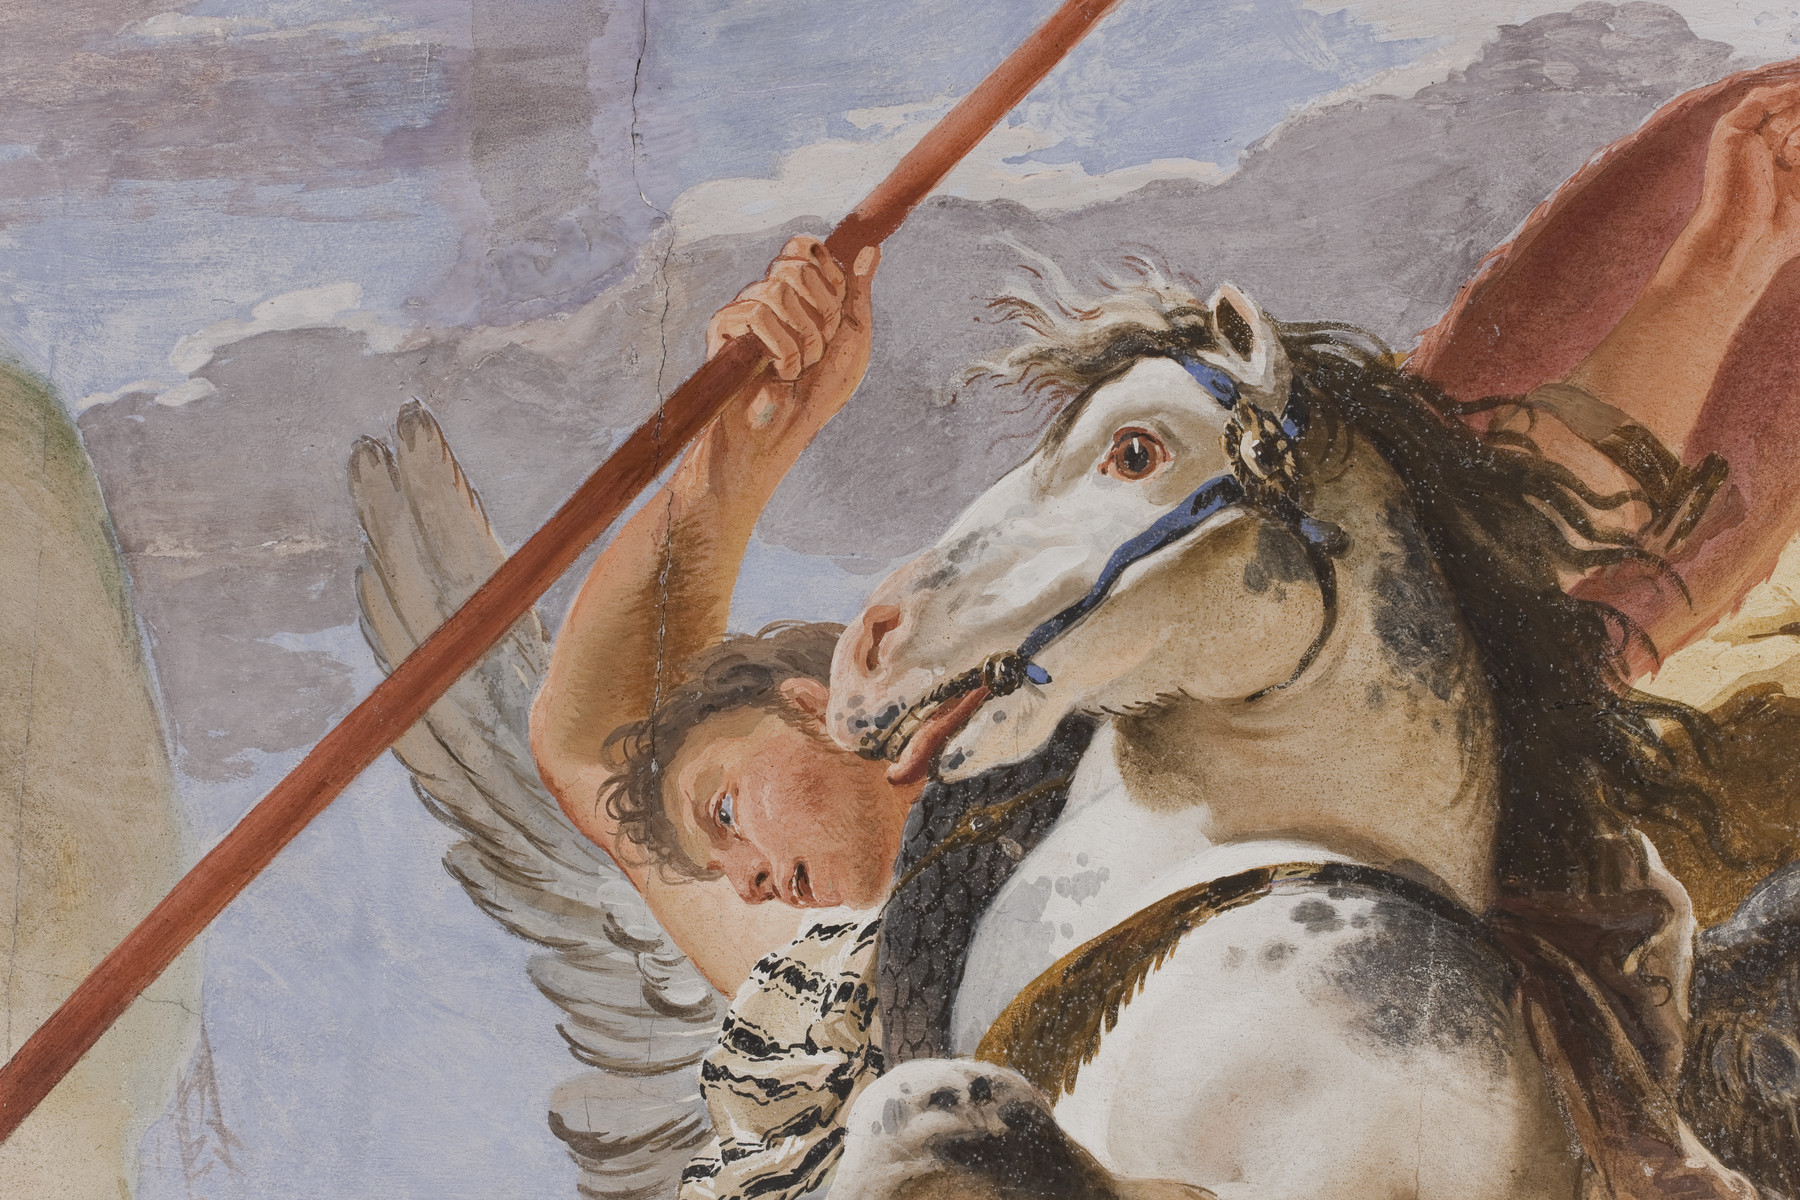 Venezianische Palazzi um 1700